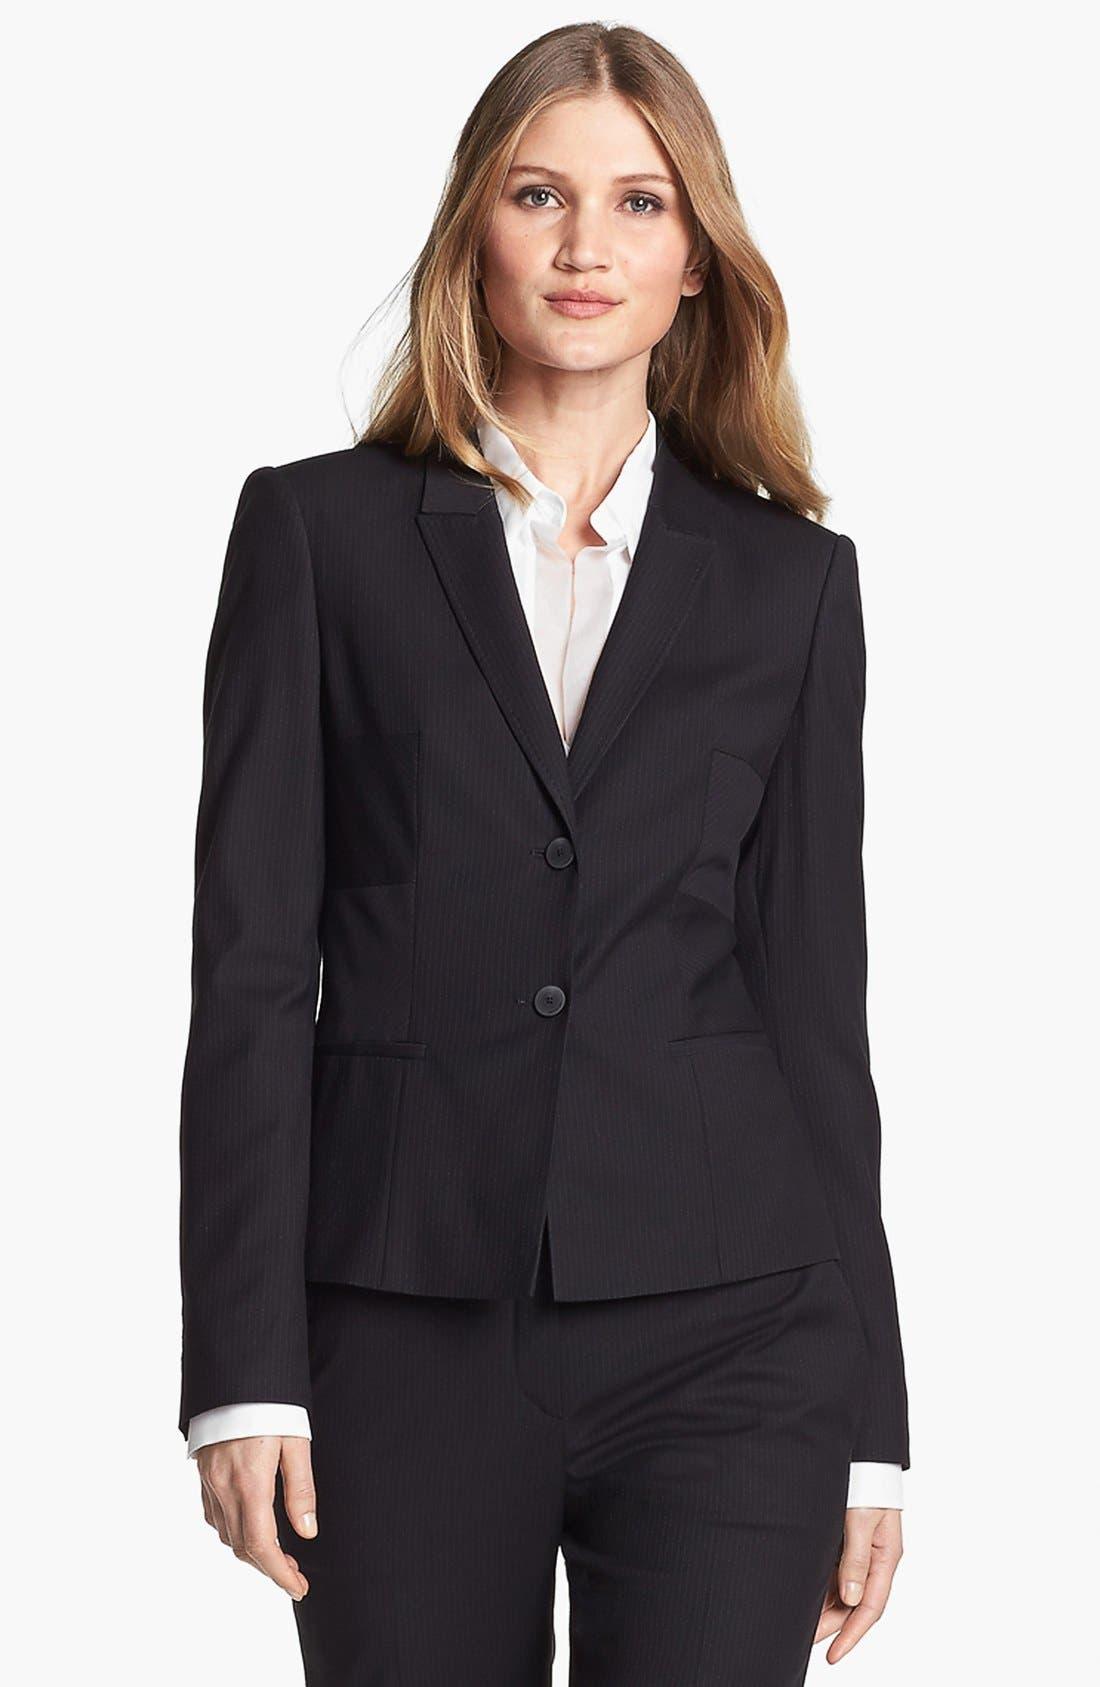 Main Image - BOSS HUGO BOSS 'Jilisa' Pinstripe Jacket